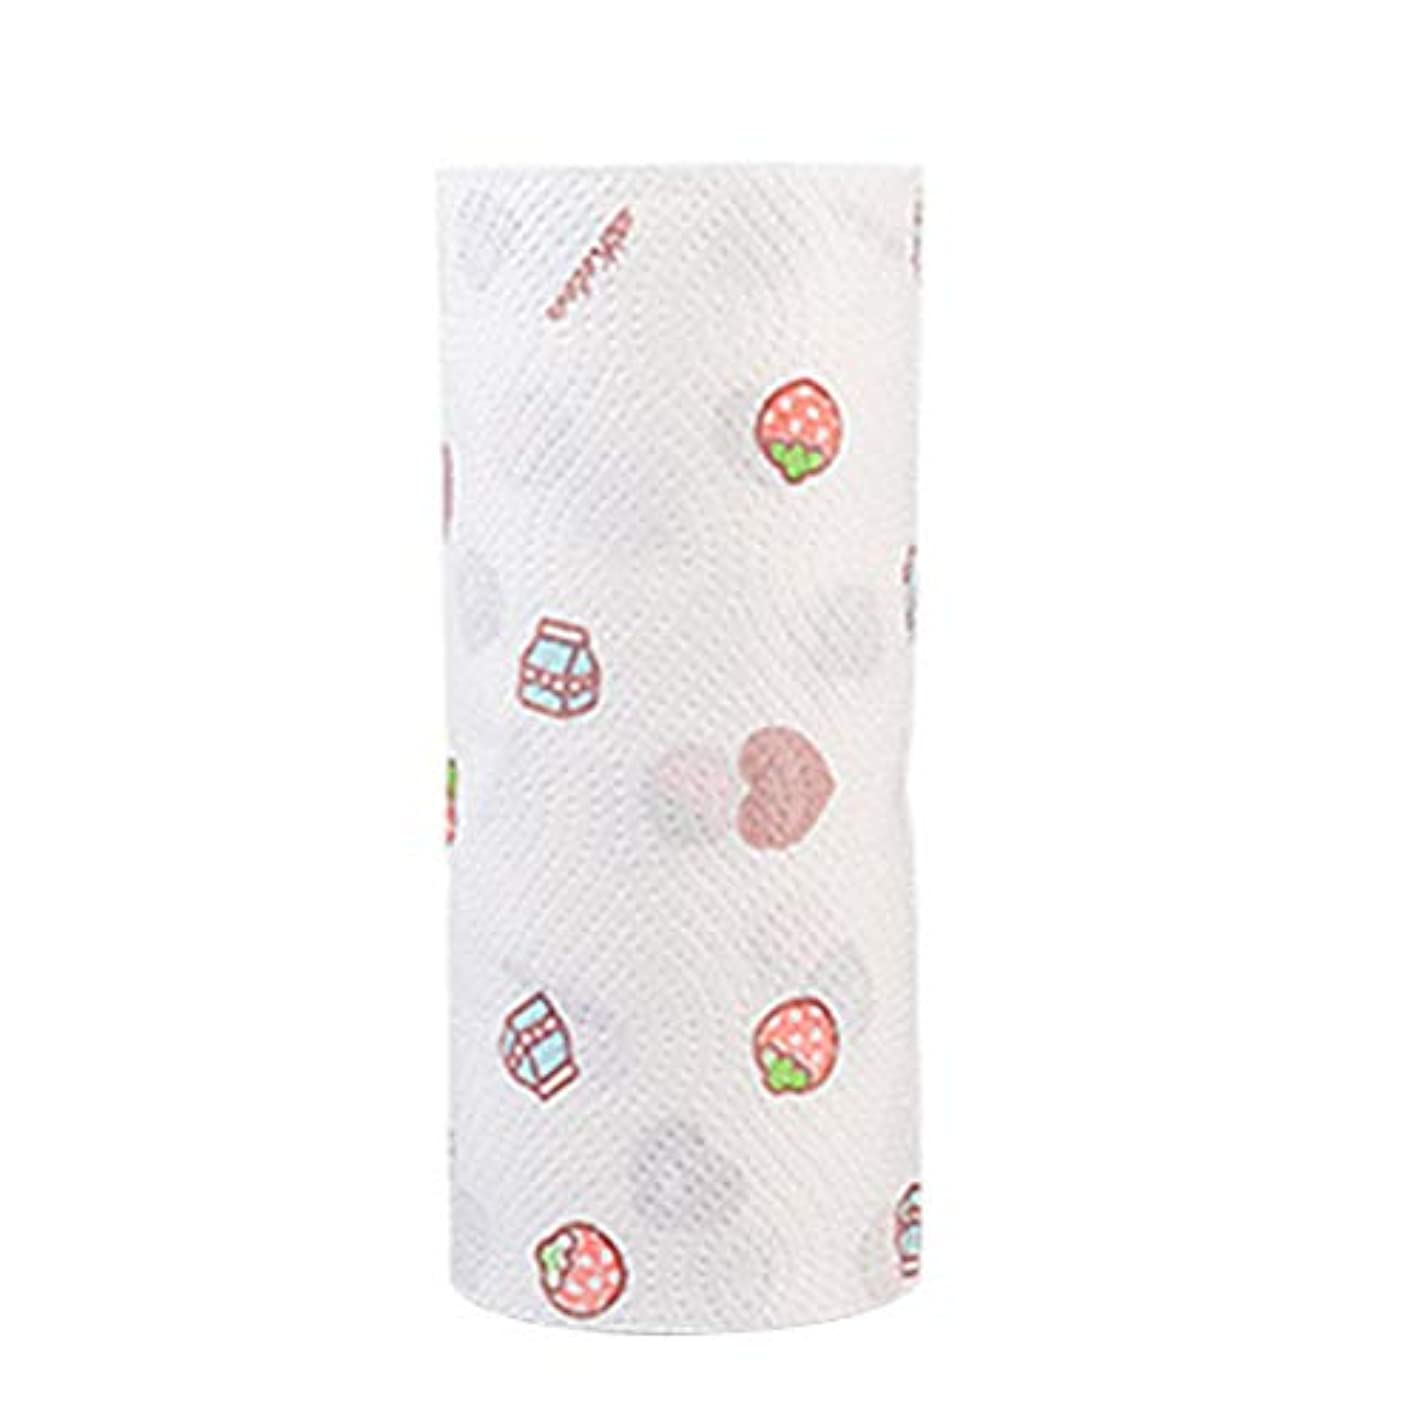 Healifty 台所紙ロール手乾燥オイルブロッティングブッチャーペーパー(ランダムスタイル)